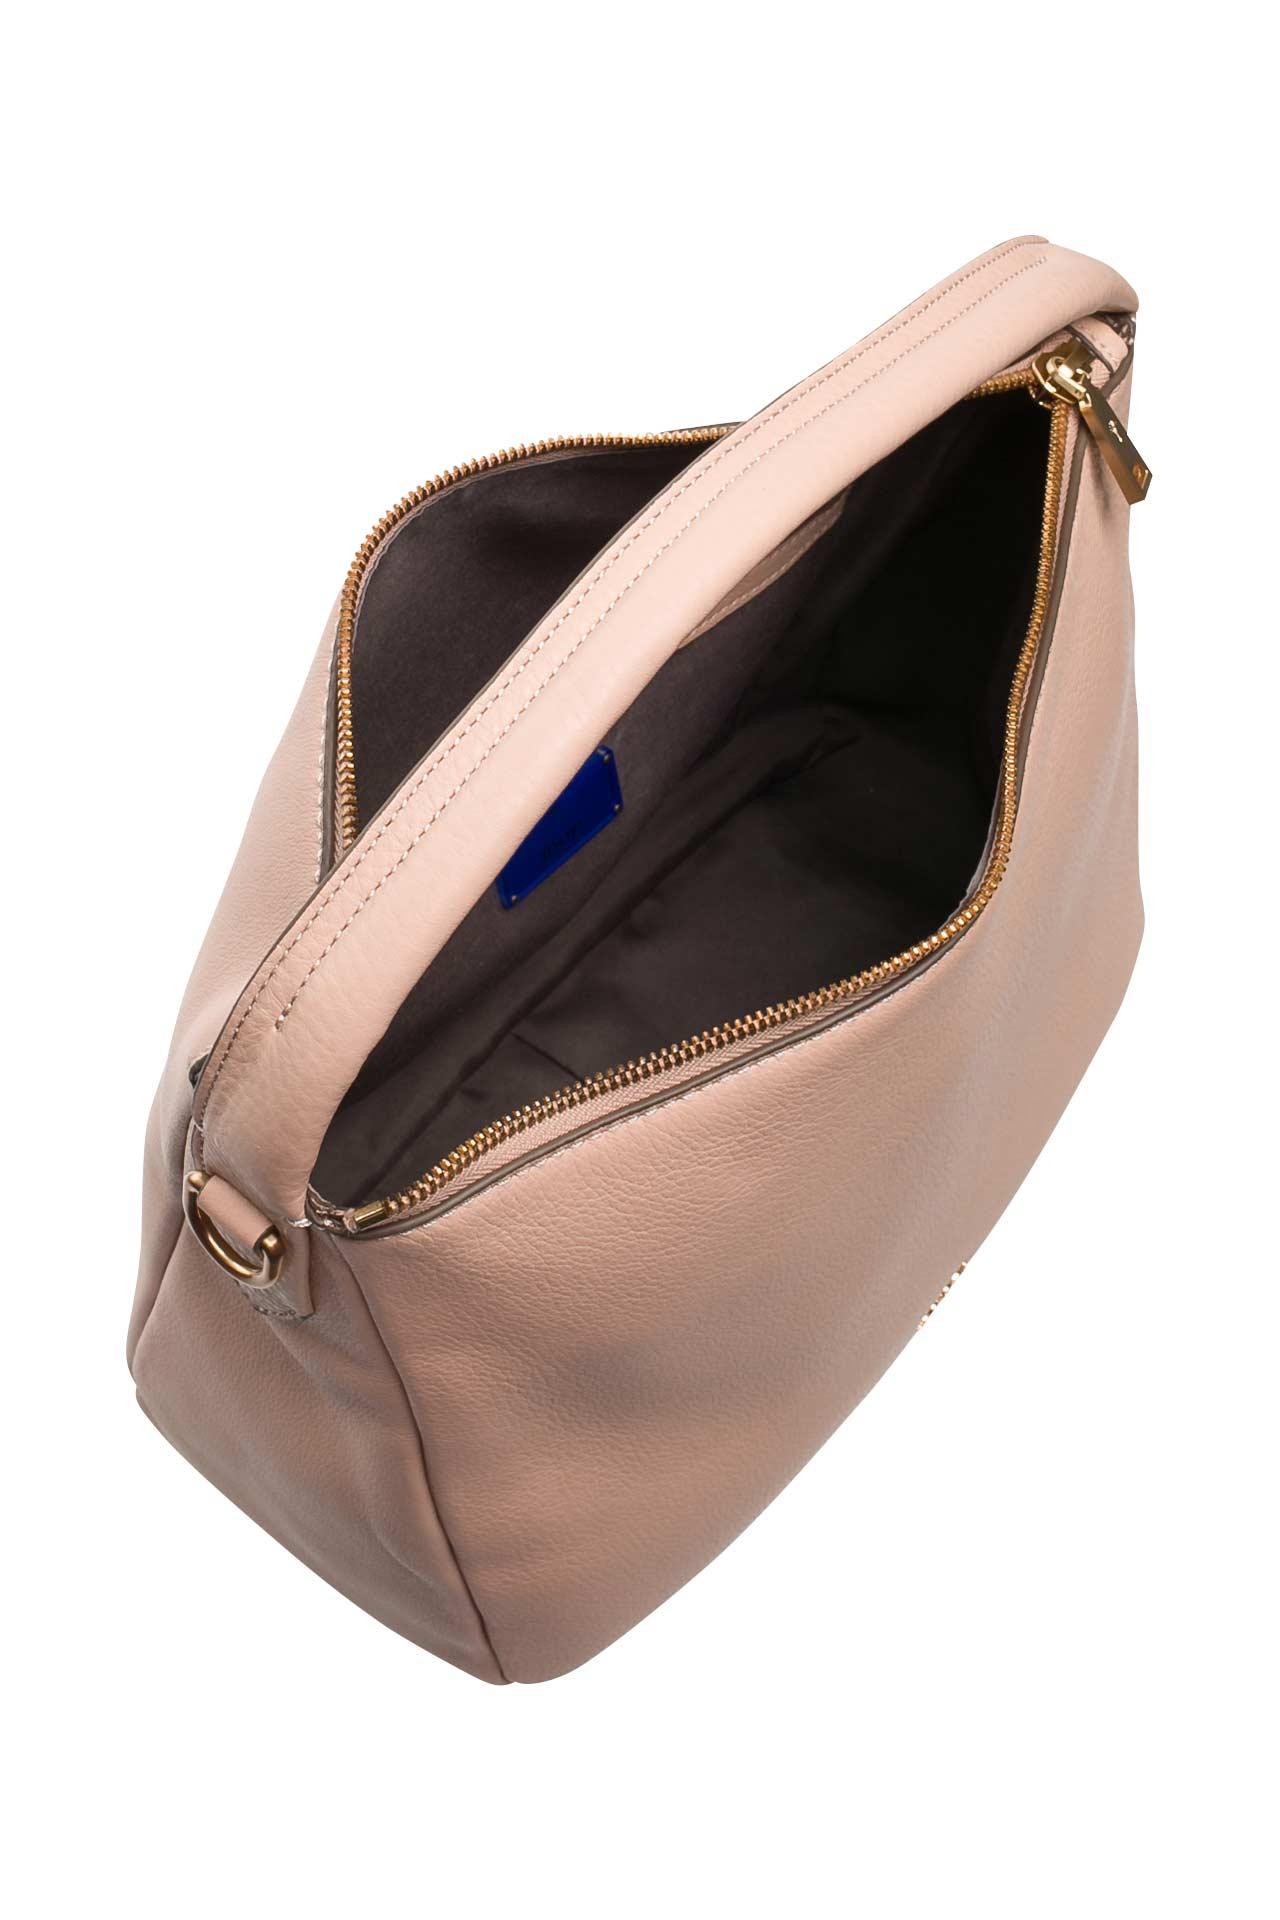 Handtasche Athina nude - JOOP! » günstig online kaufen